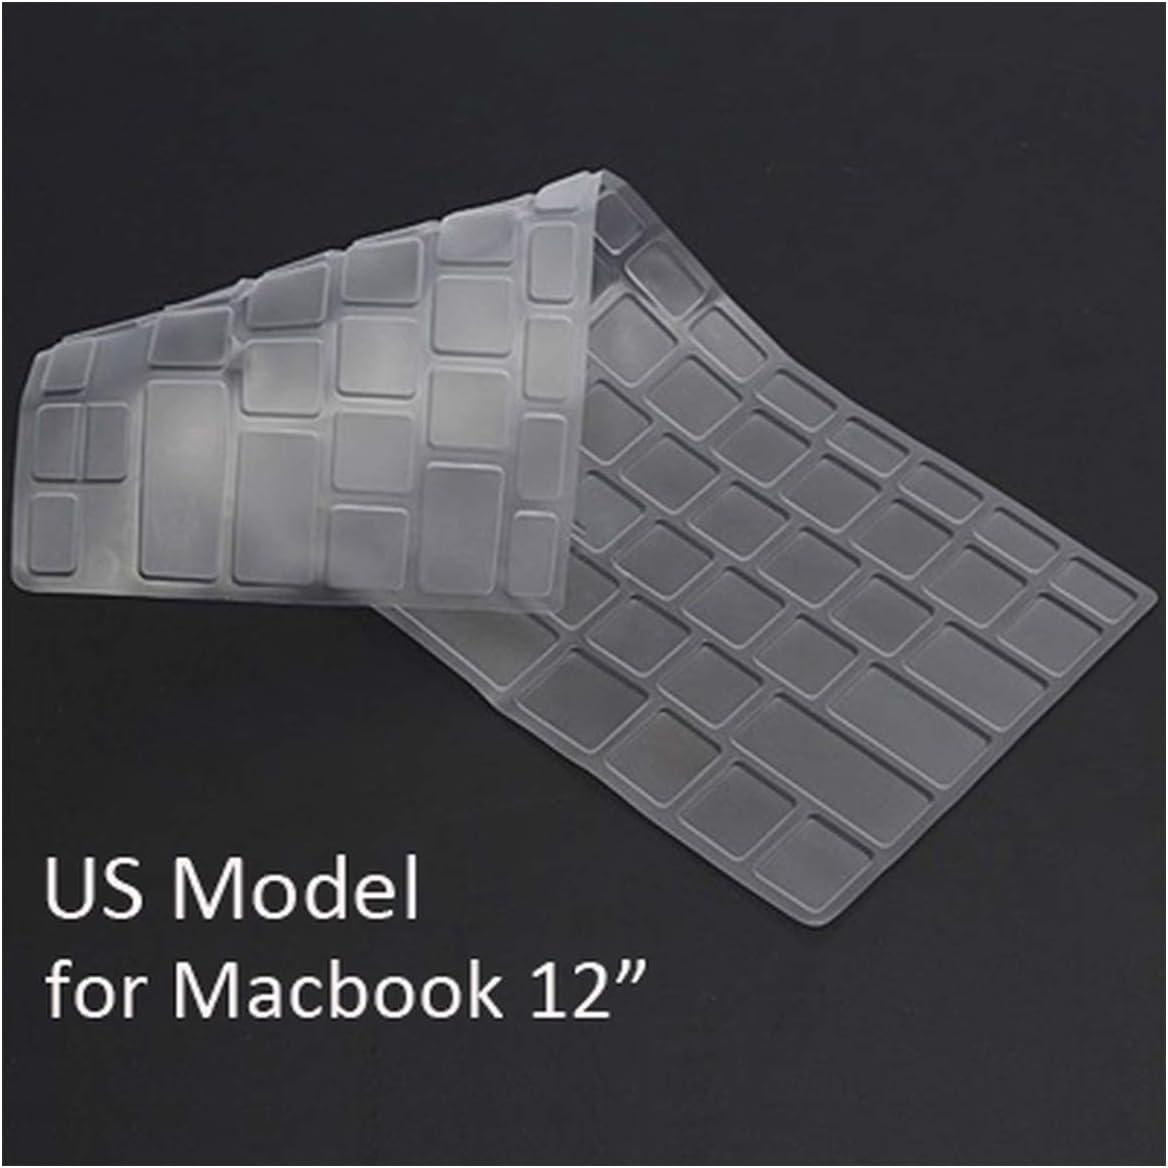 Waterproof Keyboard Cover Skin for MacBook Protector UK EU US Version TPU Transparent 11 12 13 15 17 Inch Skin for Mac,US 11